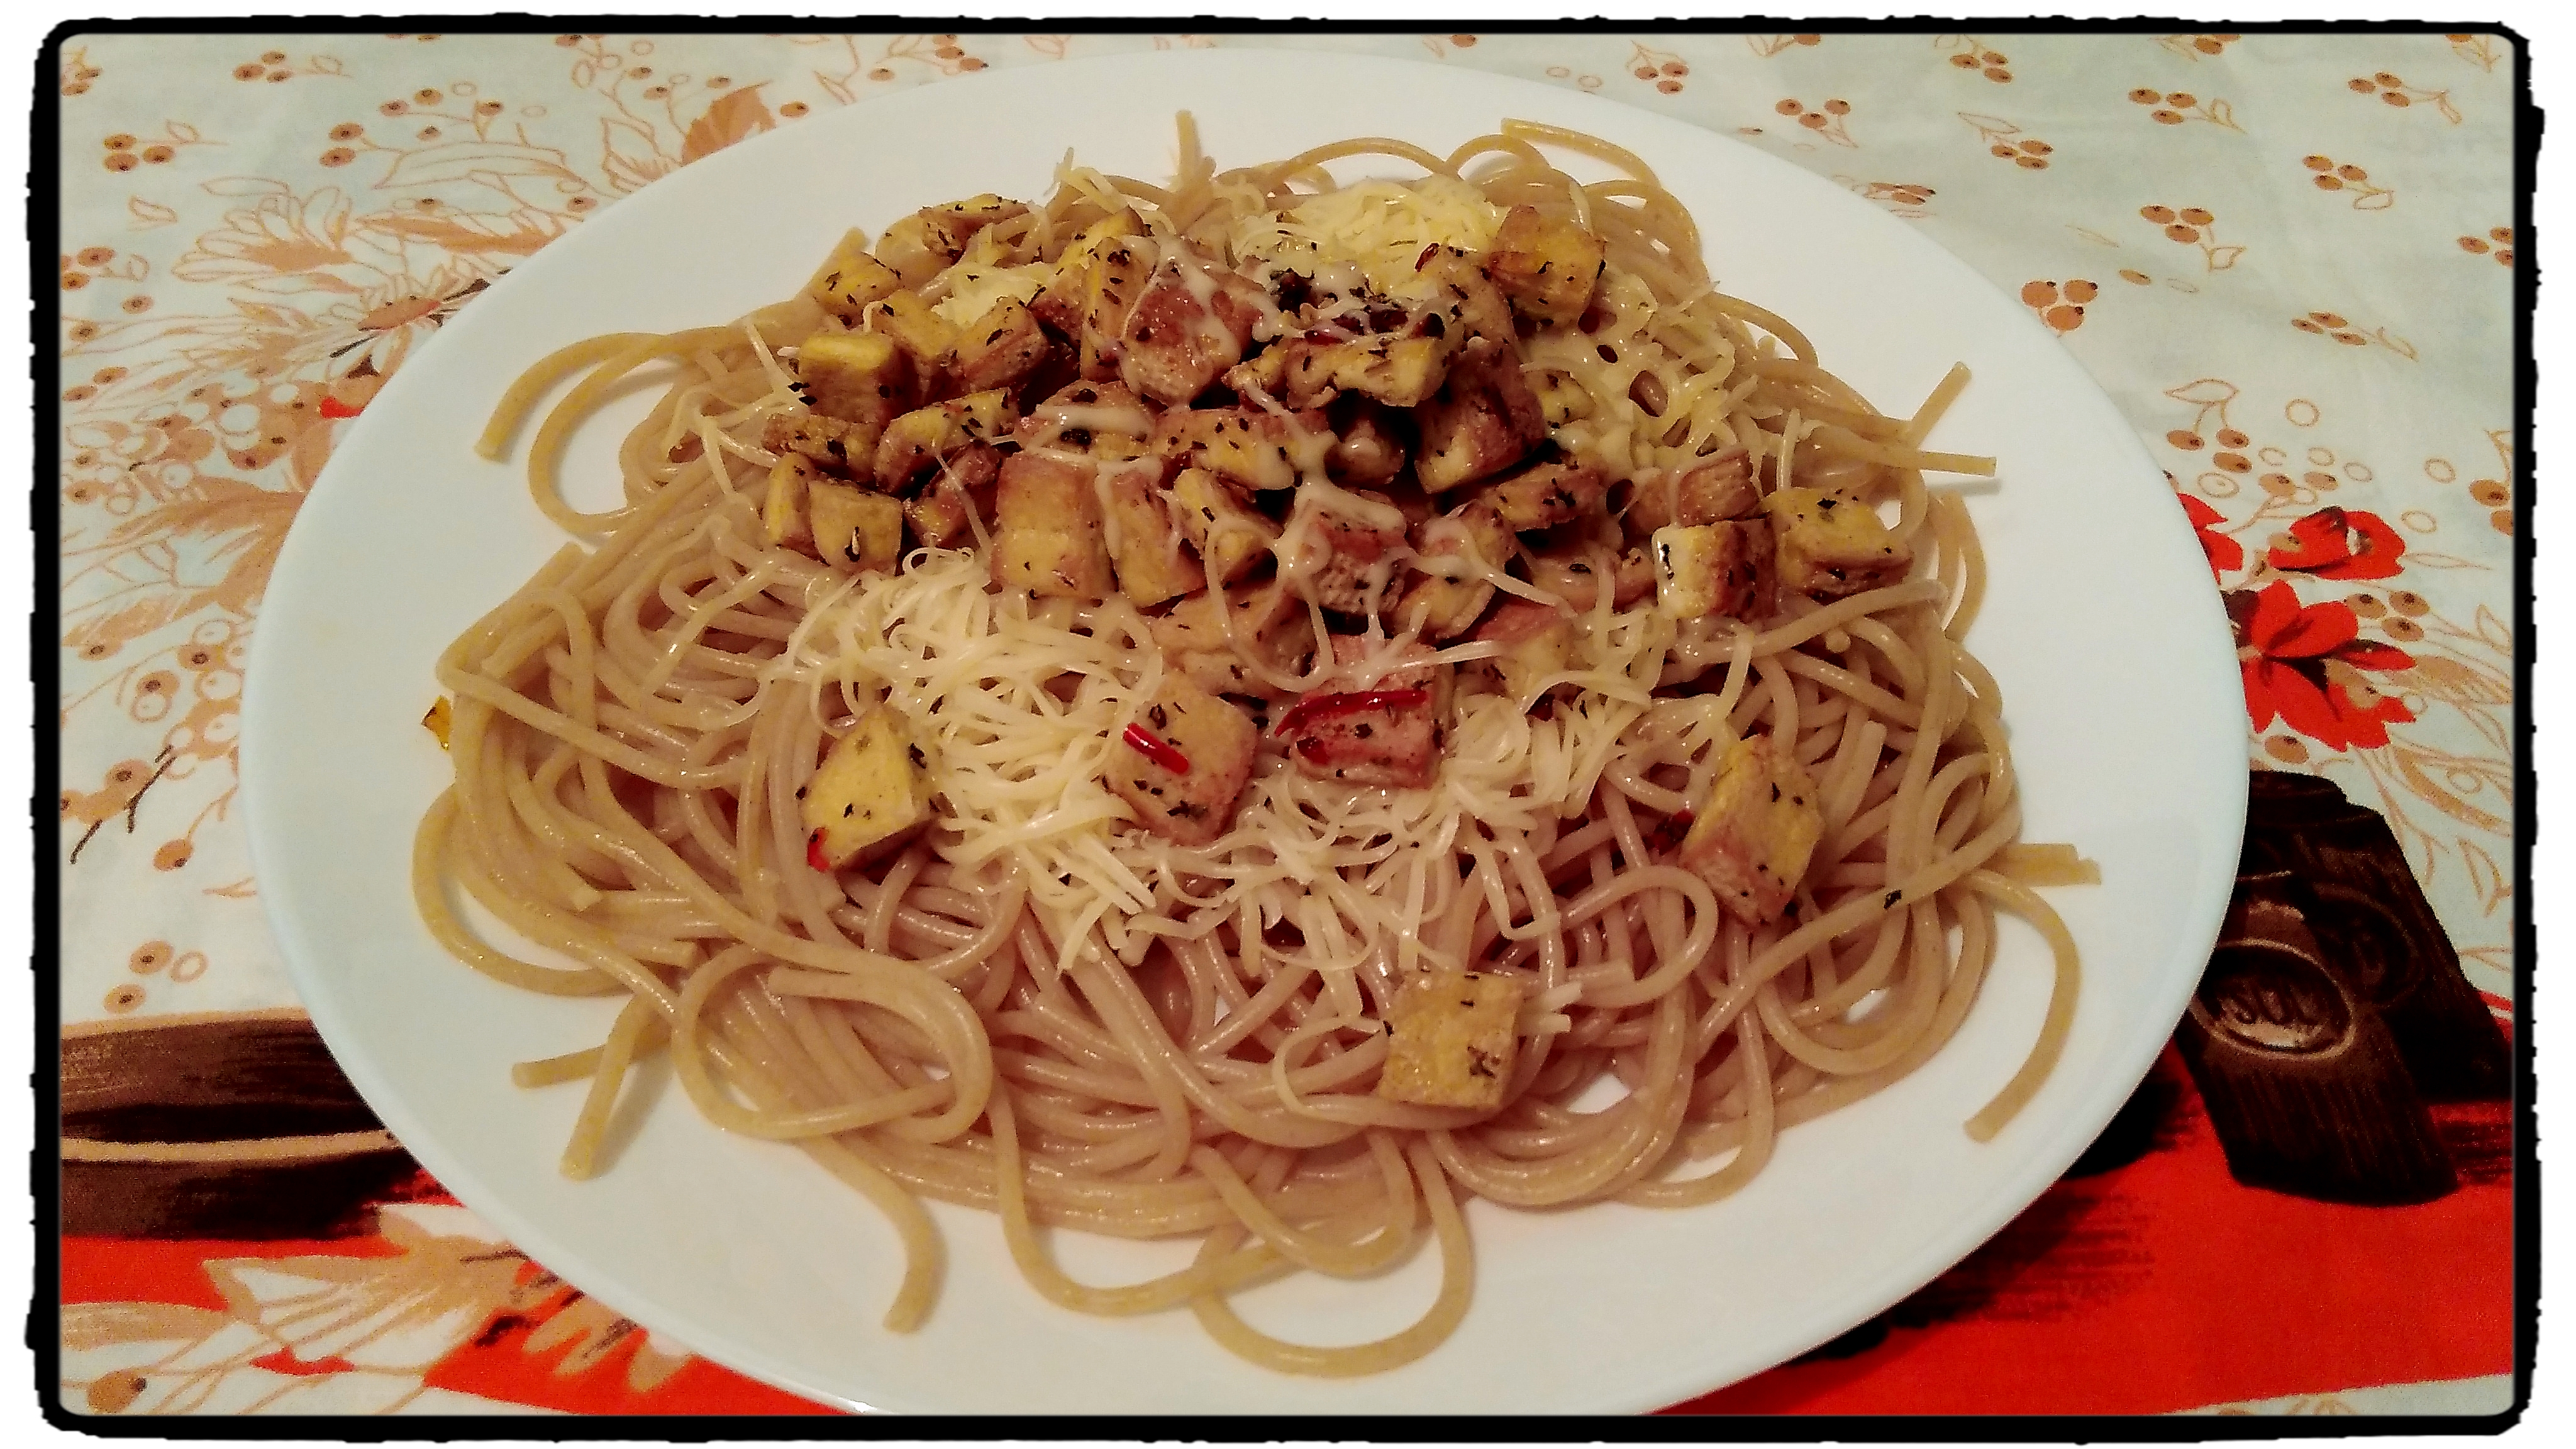 špagety, pasta, tofu, healthy food, chilli